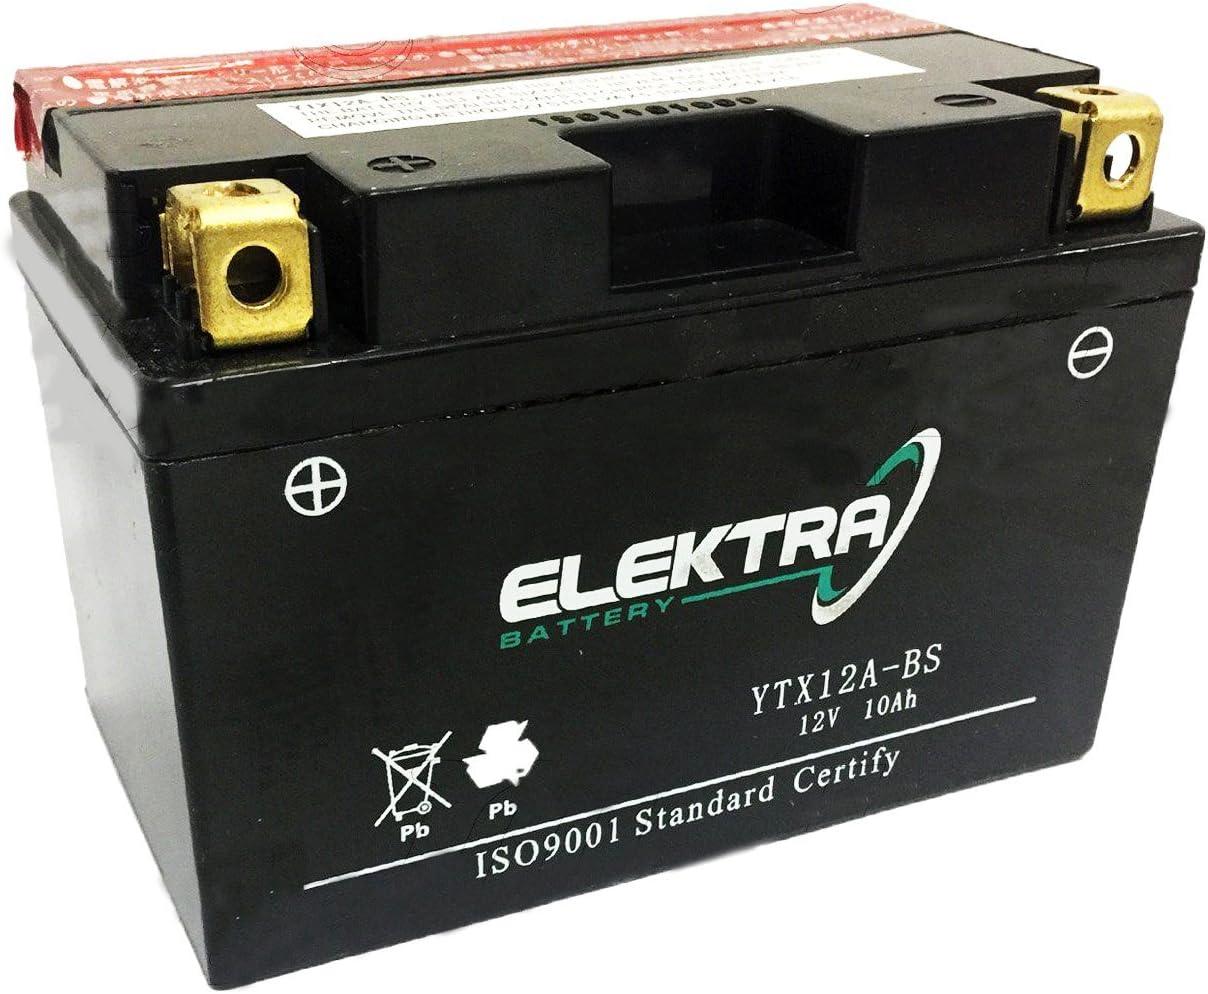 BATTERIA POTENZIATA ELEKTRA YTX12A-BS PER SUZUKI XF Freewind 650 1997-2003 12V 10 Ah CON ACIDO